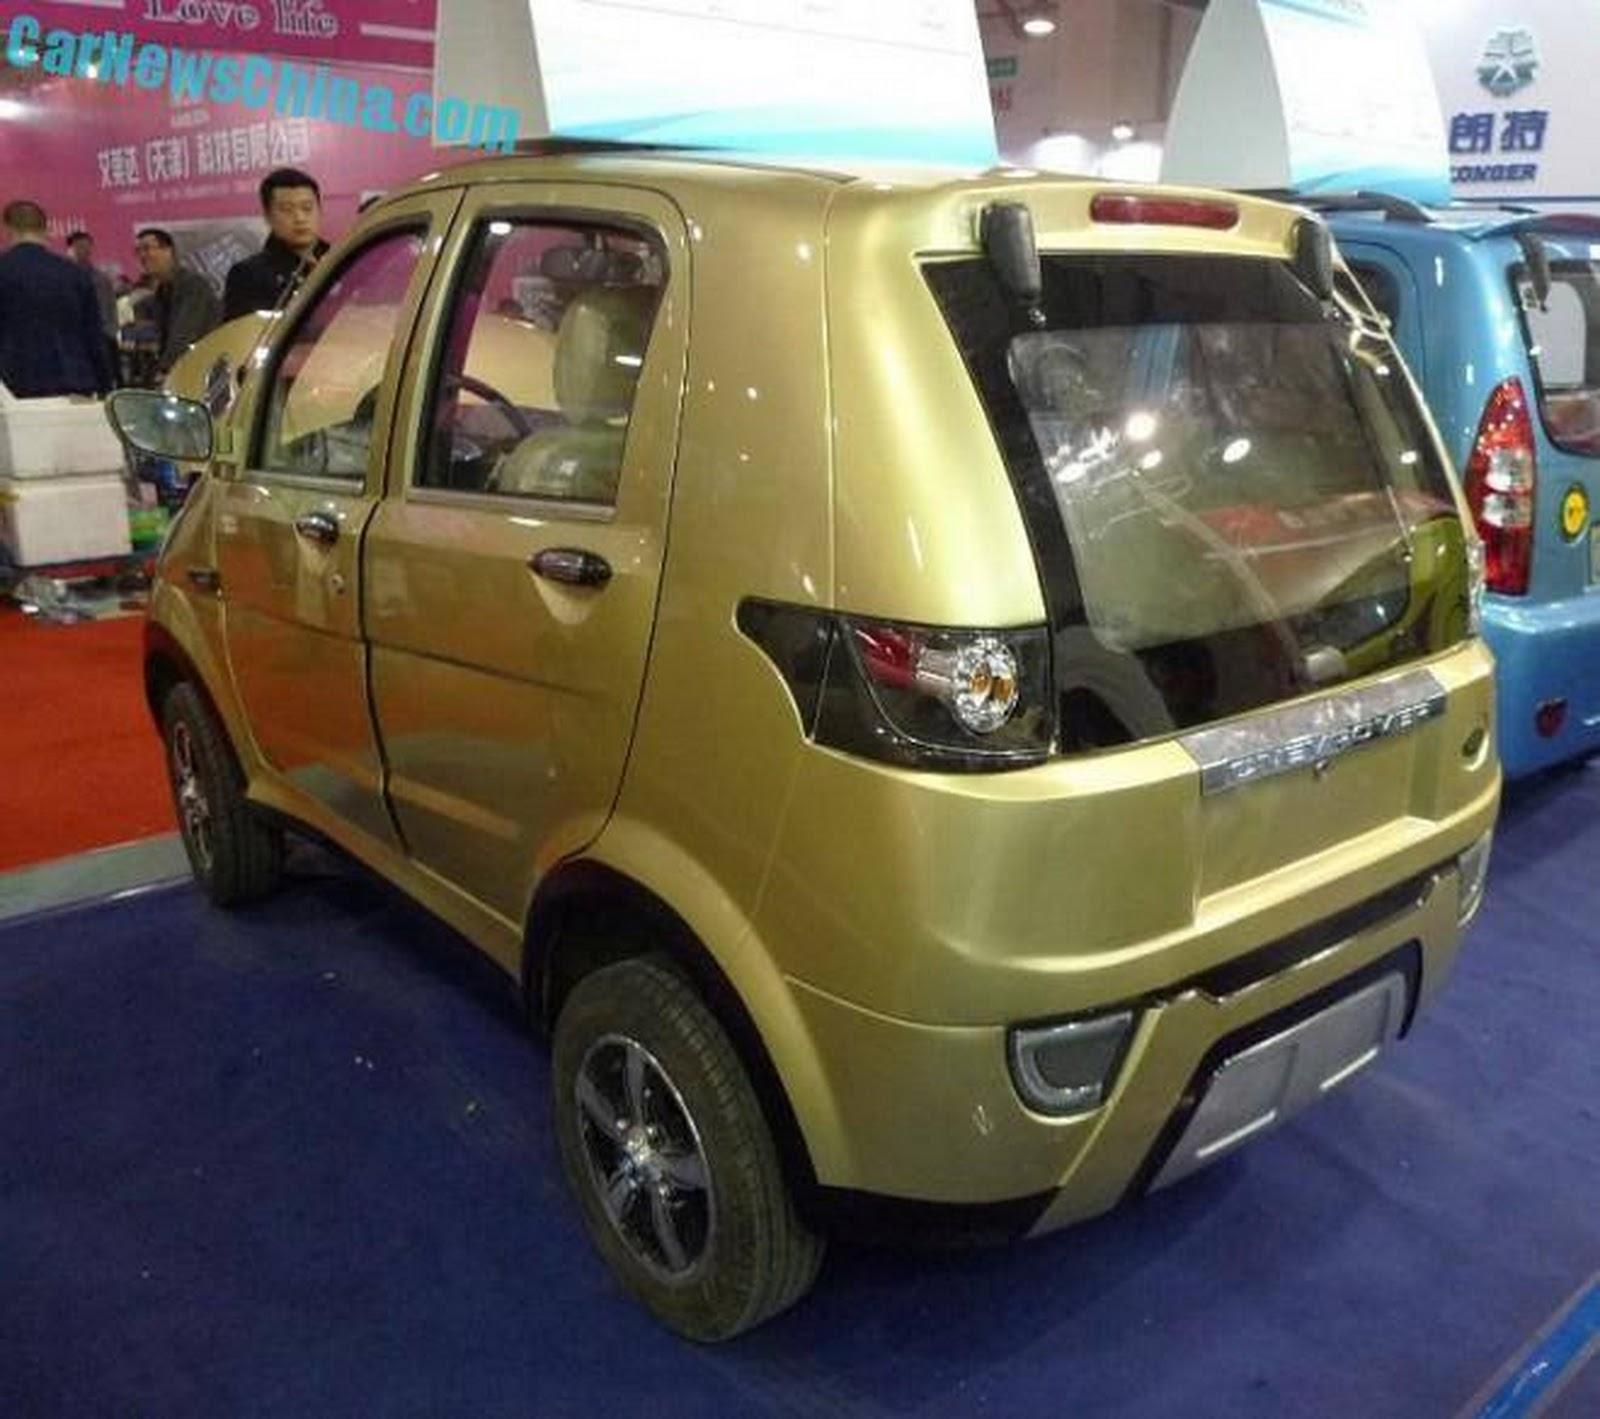 Mini-Me Range Rover Clone From China